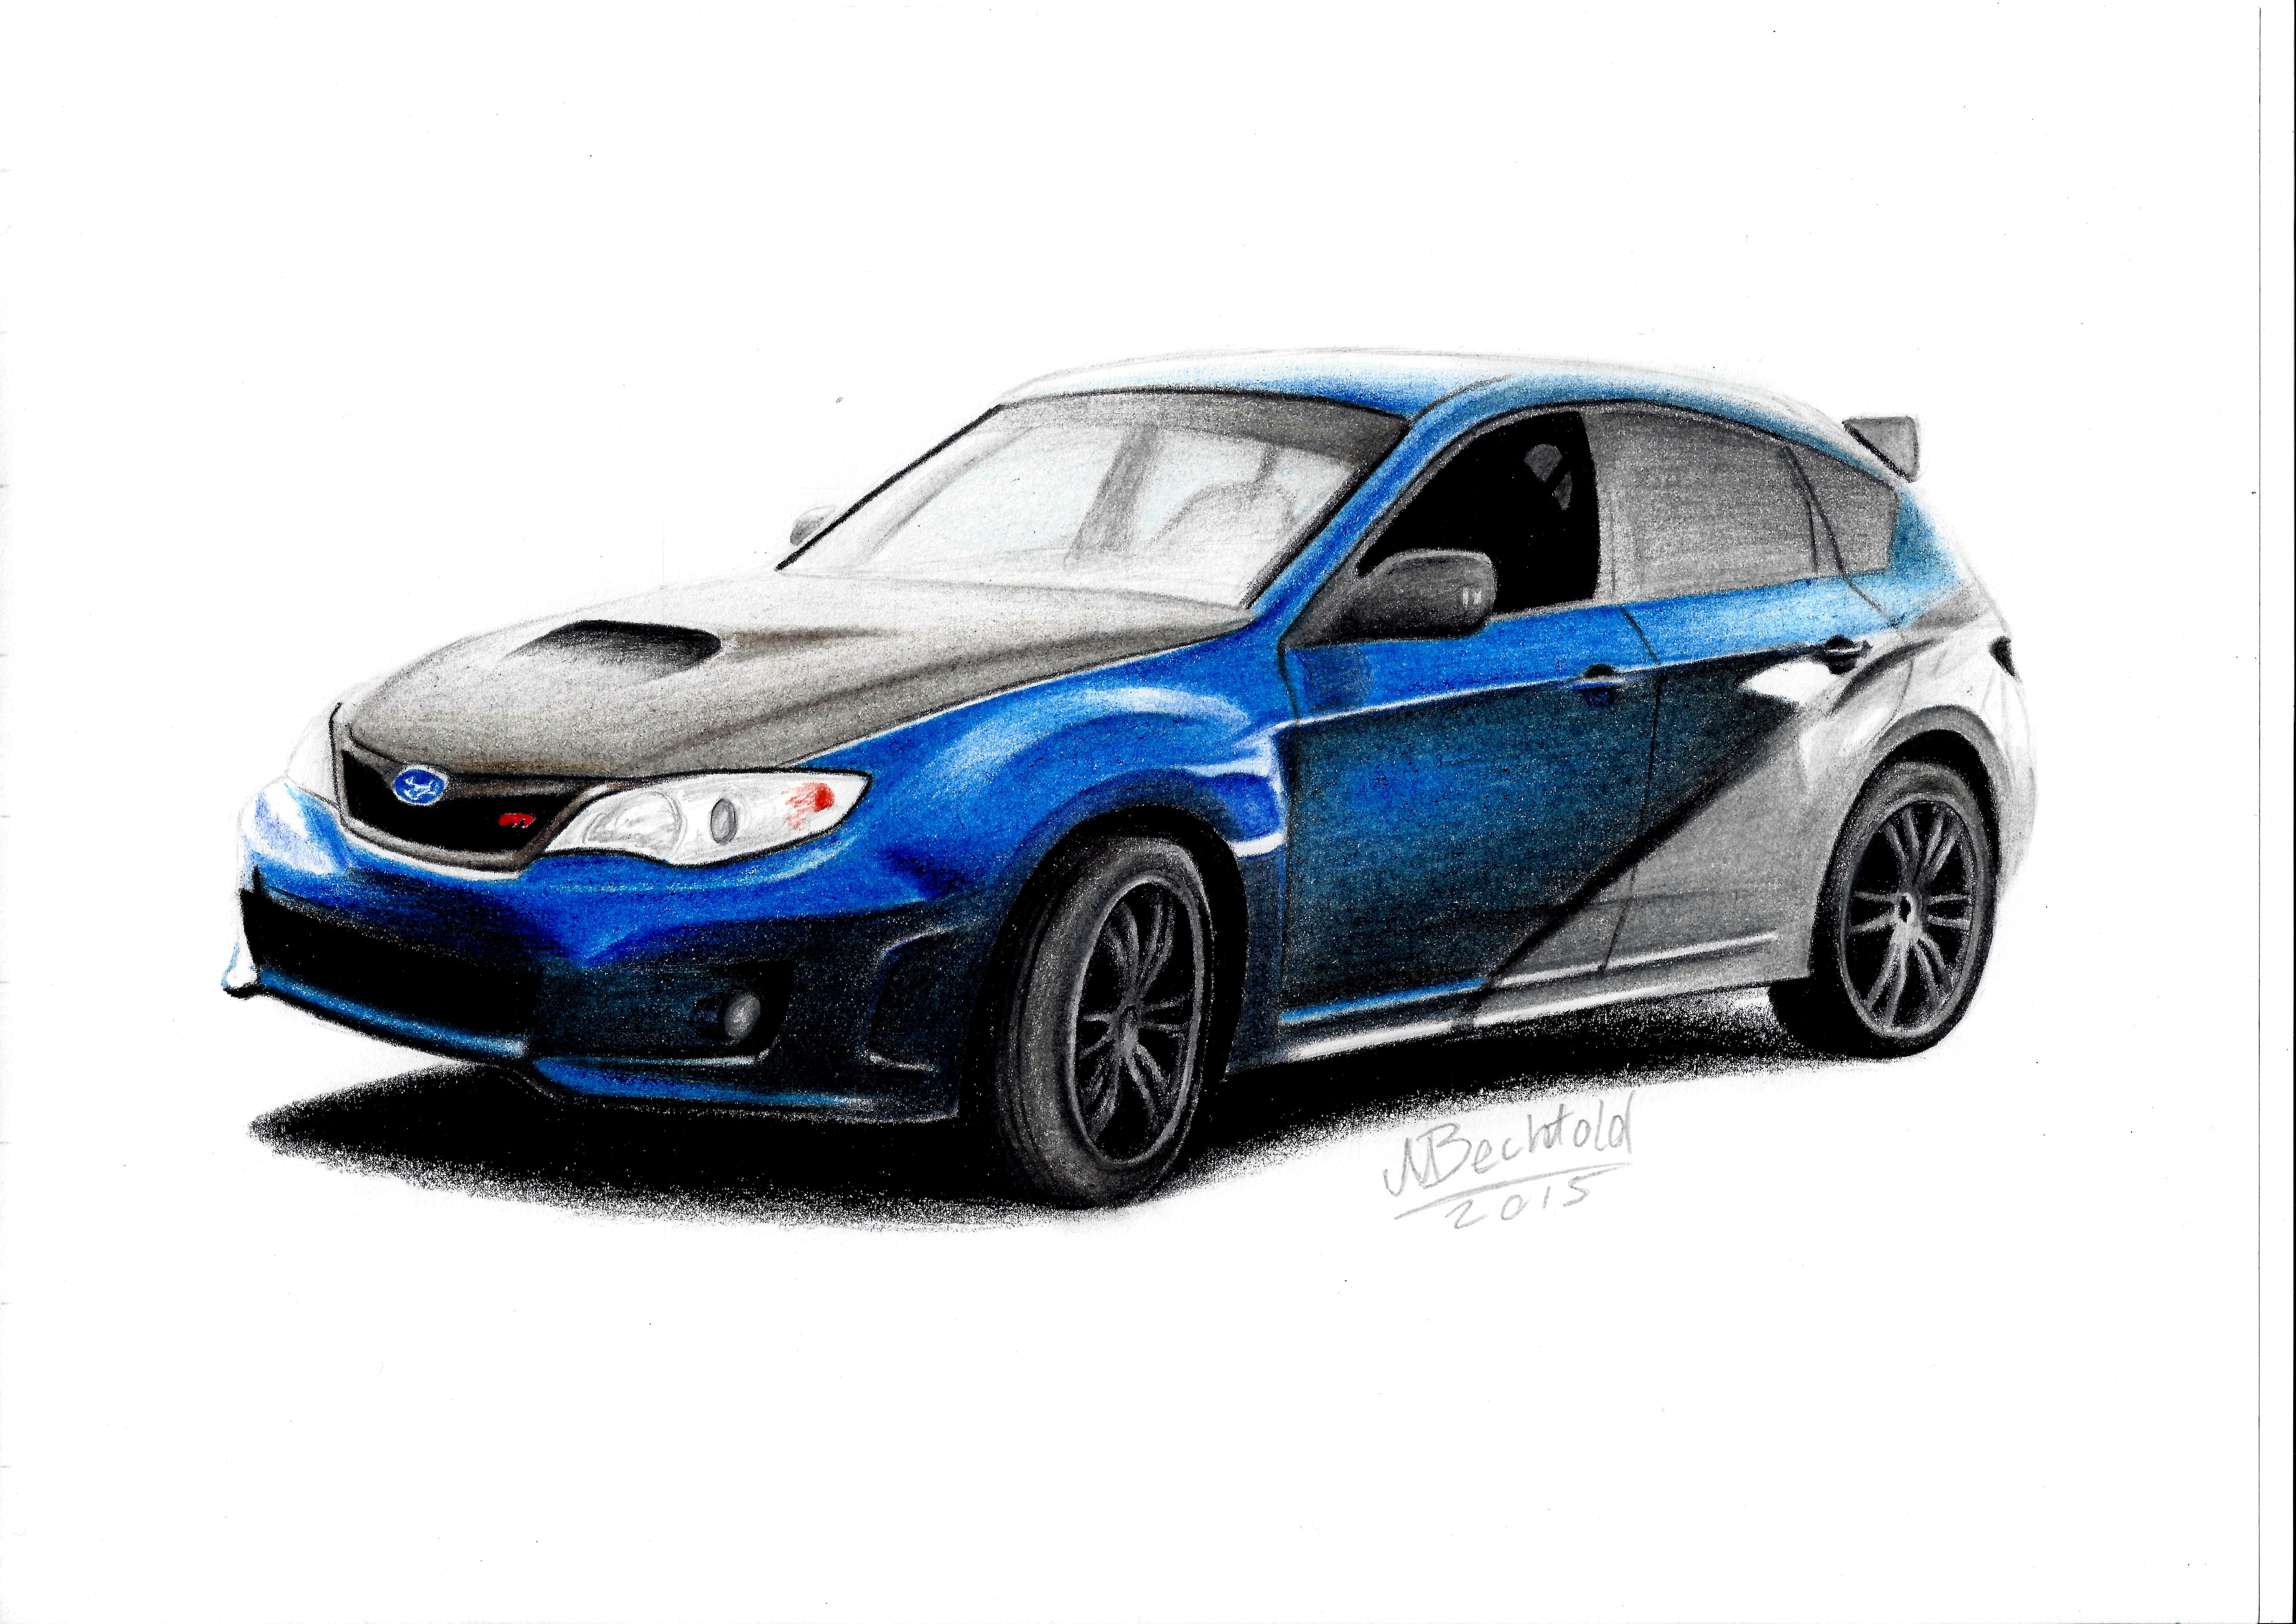 Subaru Impreza Wrx Sti Car Drawing Best Cars 2018